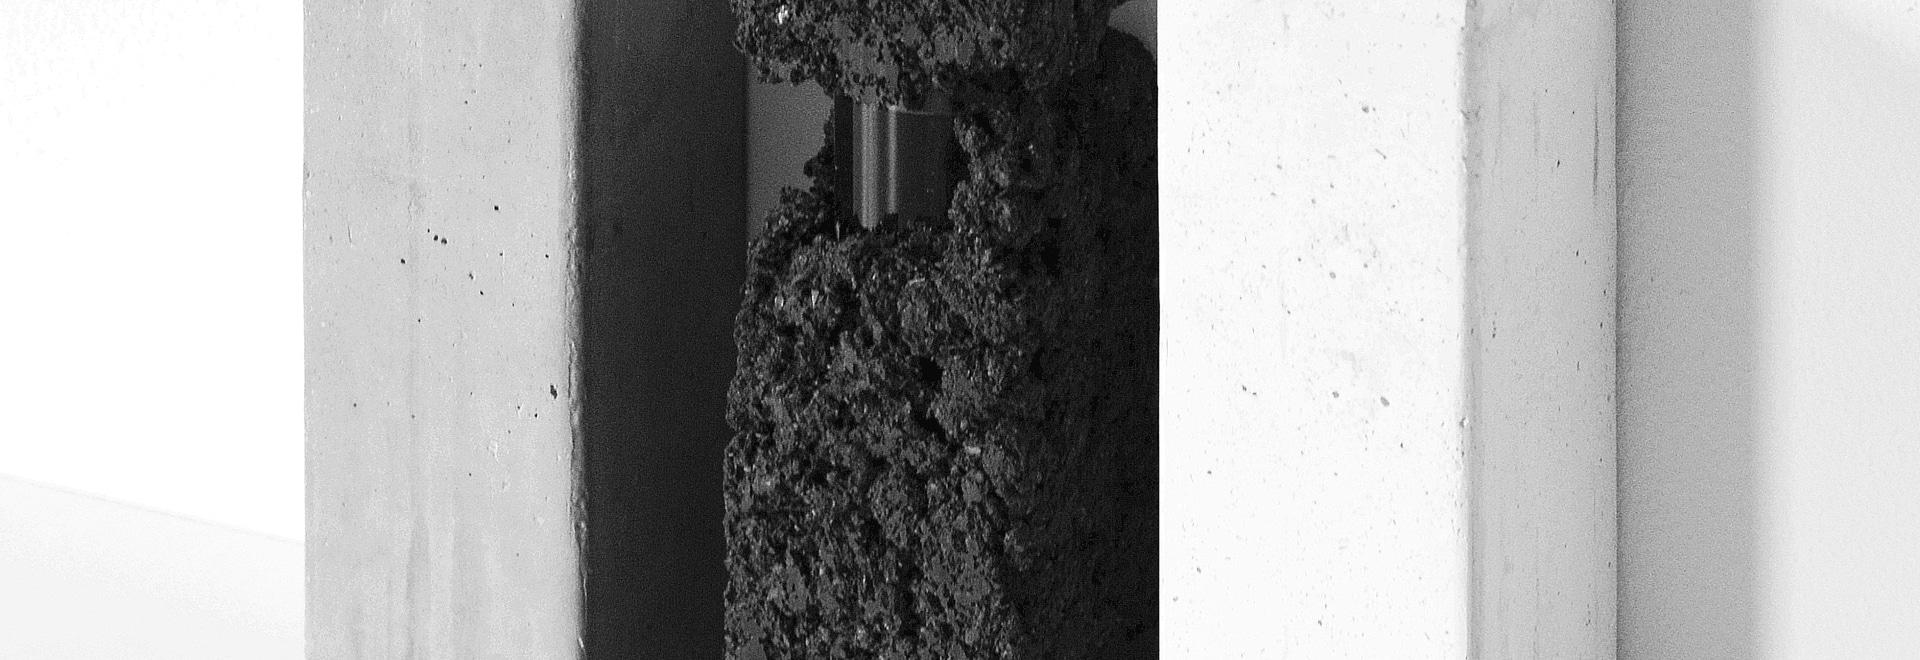 Francesca Gotti verbirgt Parfüm innerhalb Glebanite-Blöcke